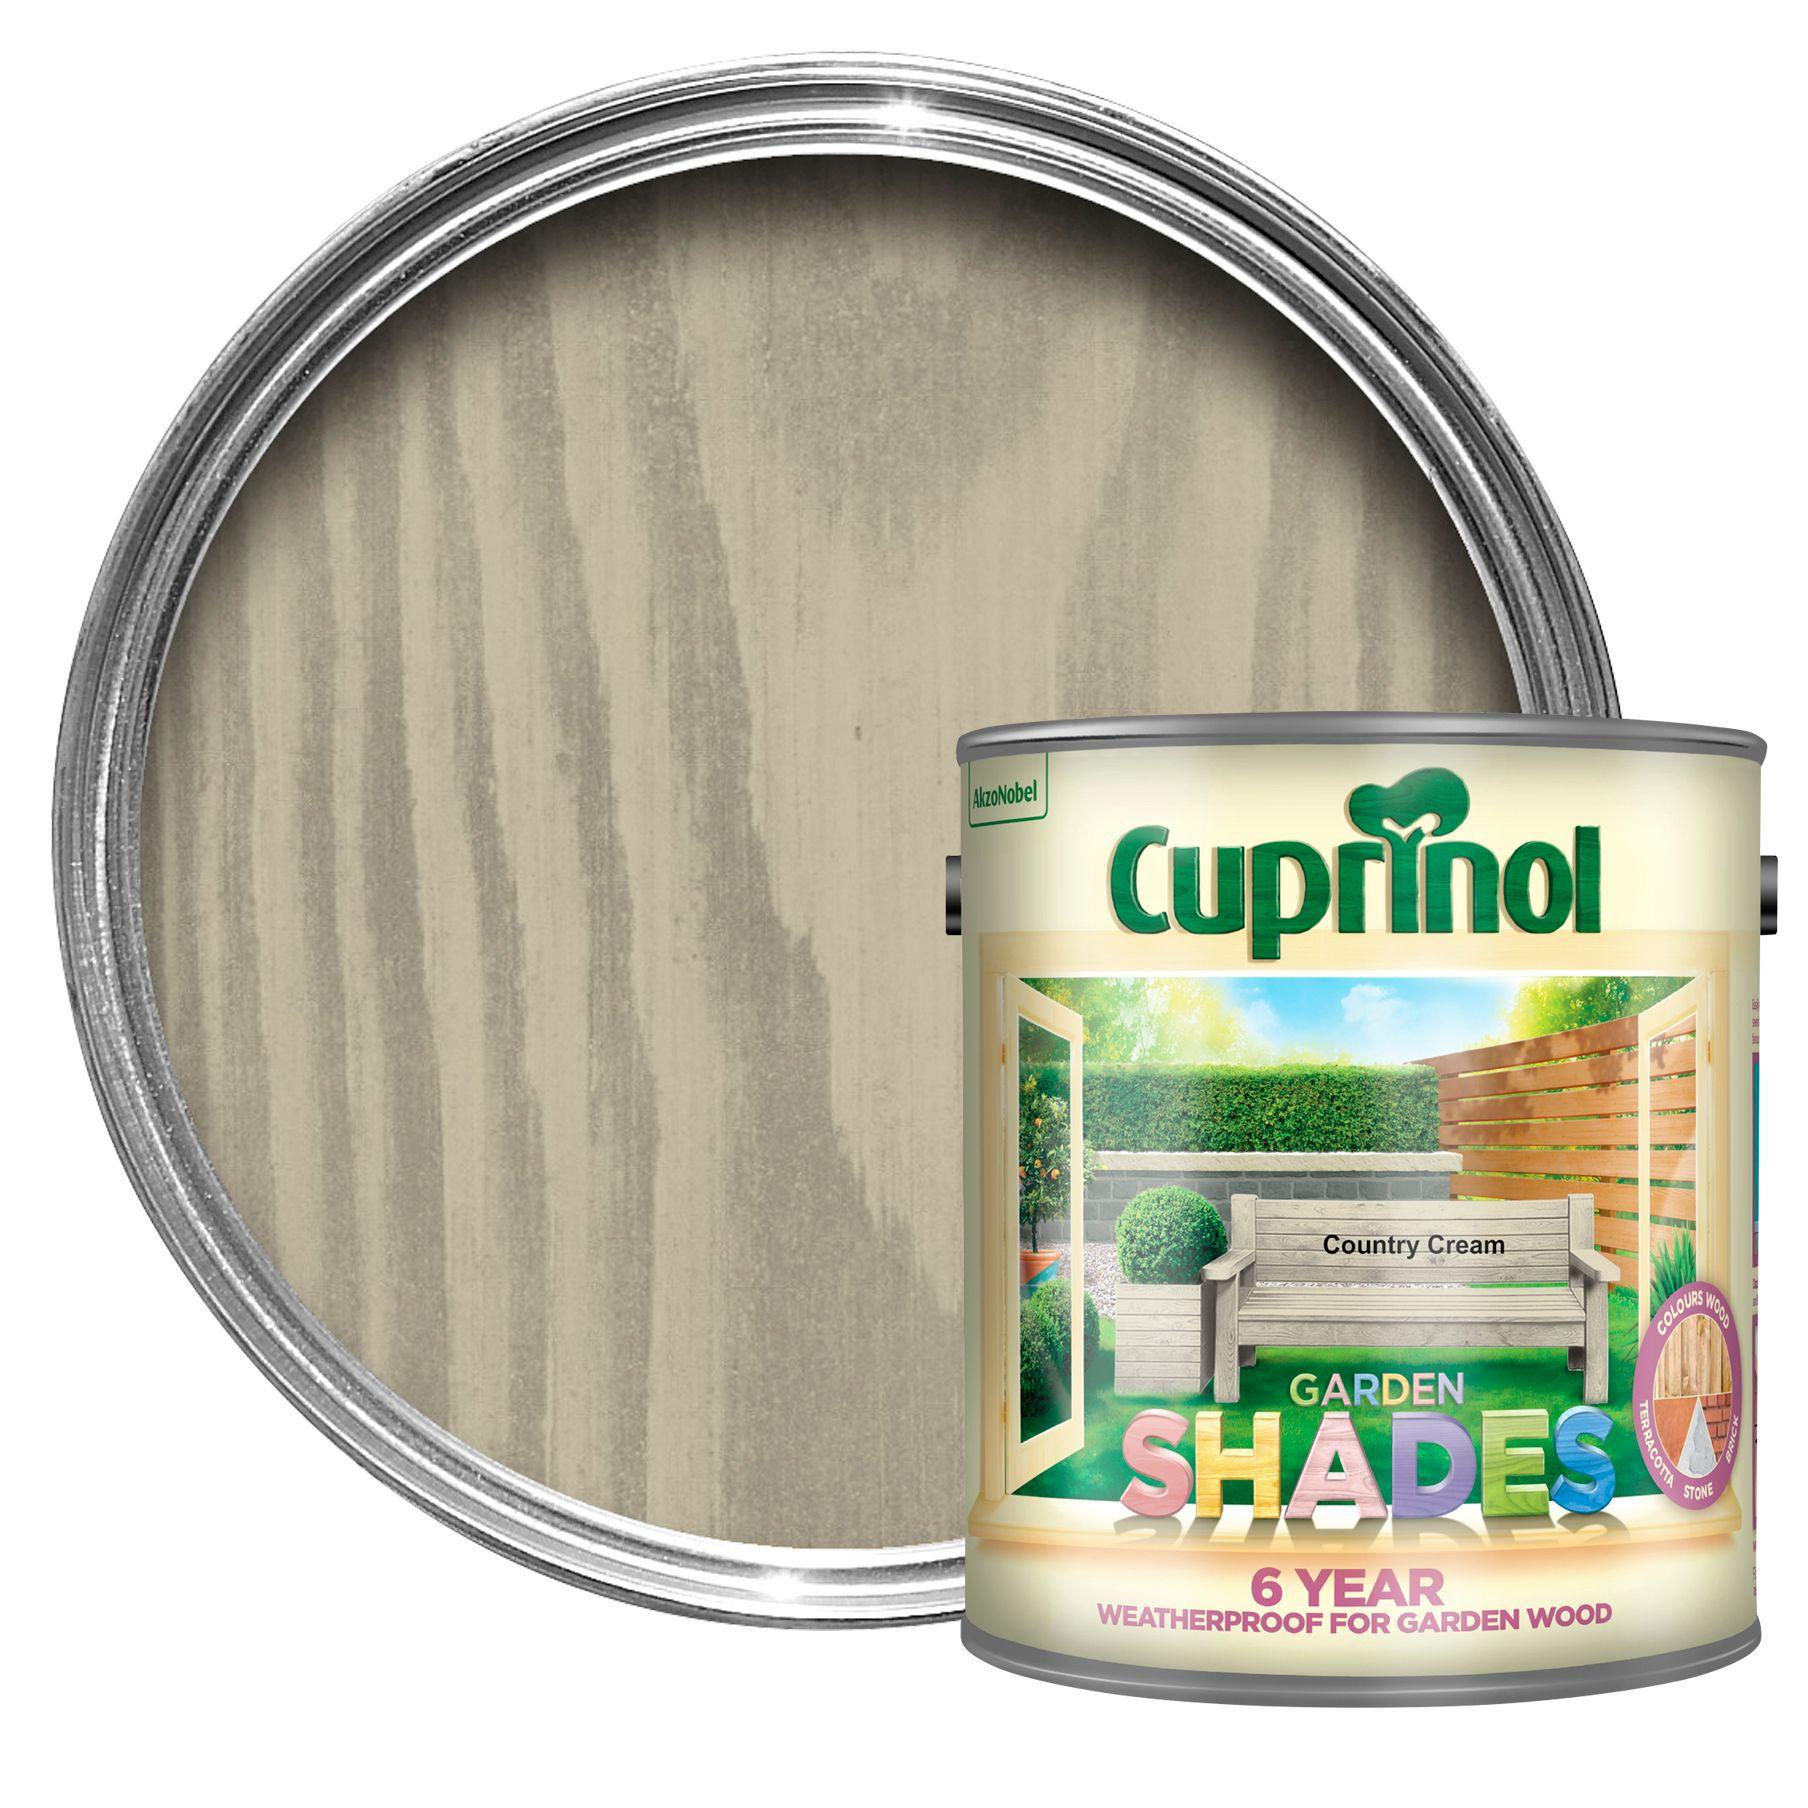 Cuprinol Garden Shades Country Cream Matt Wood Paint 2 5l Departments Diy At B Q